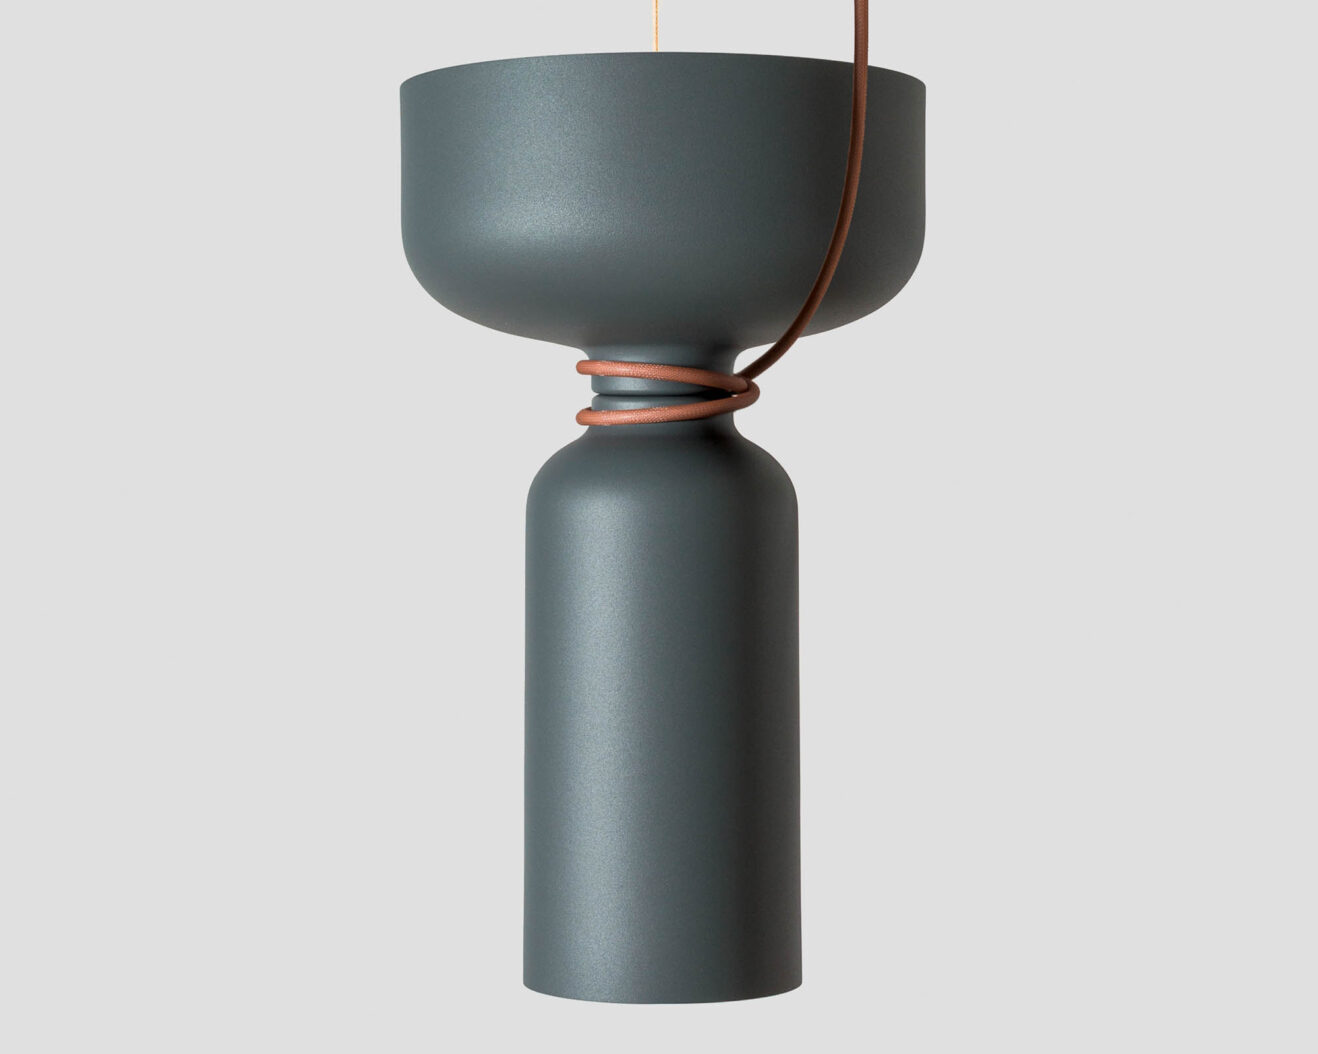 Andlight-Pendant-Lamp-DA-Avocado-Savannah Bay Gallery